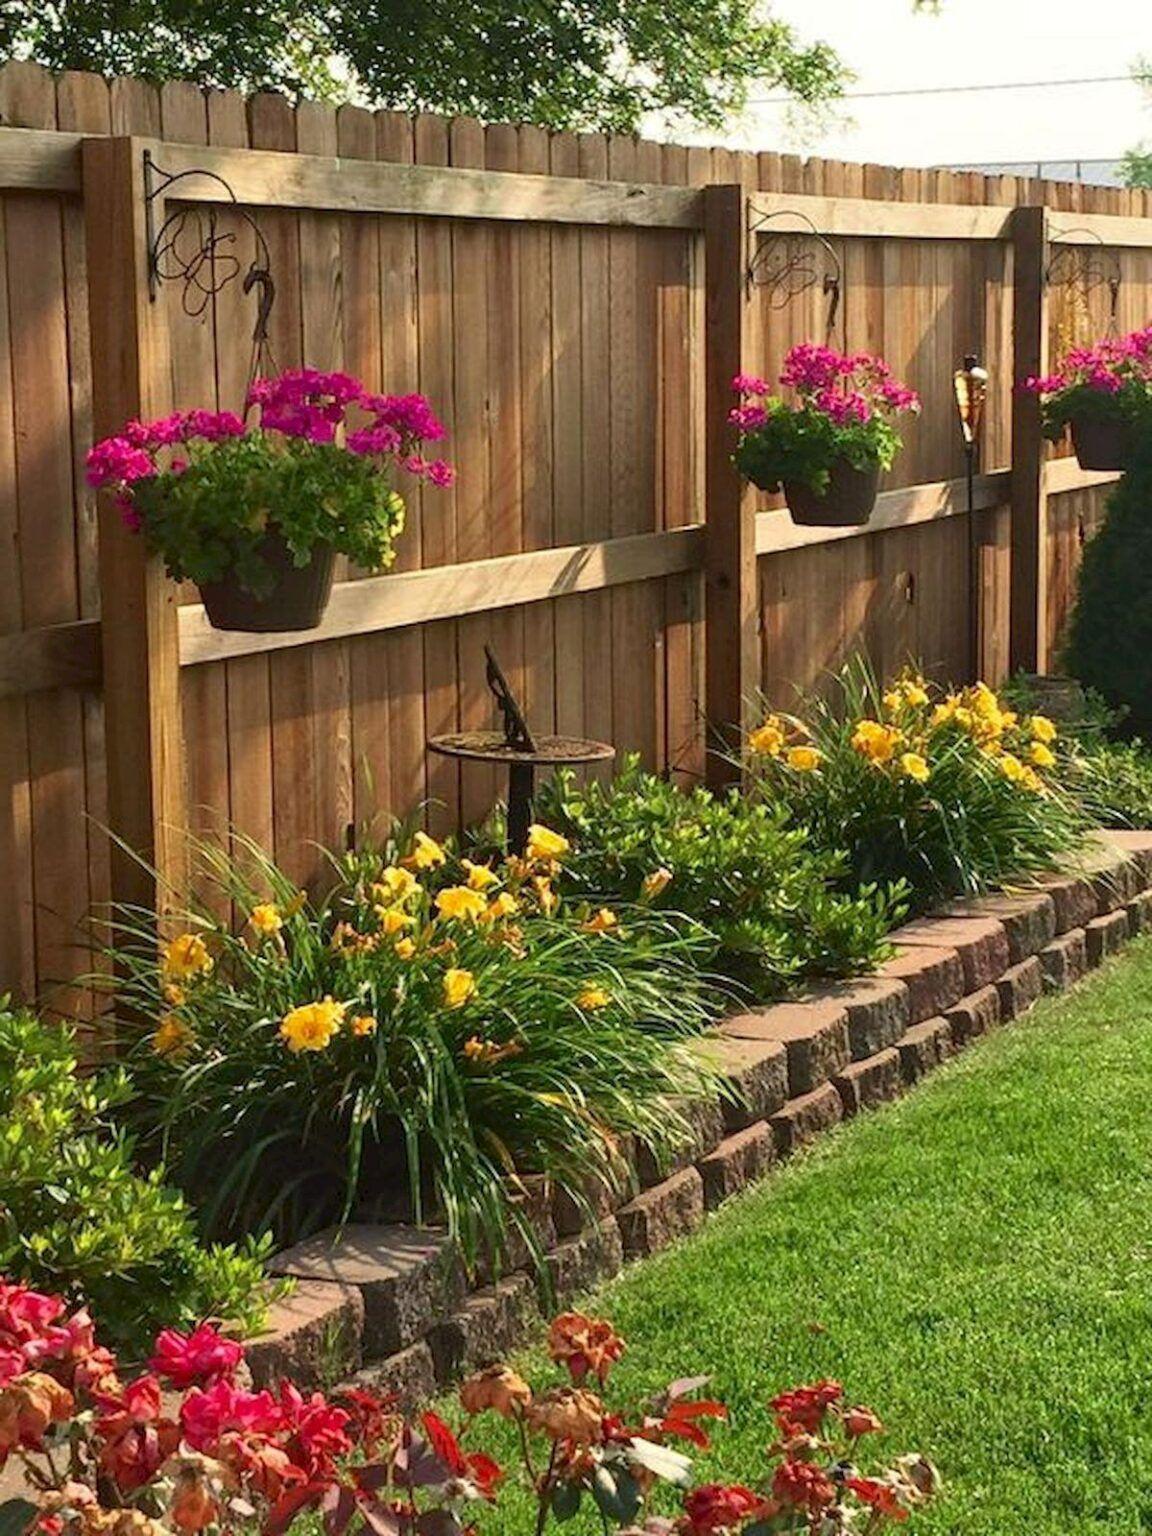 81 Popular Summer Garden Decorating Ideas 23 Best Inspiration Ideas That You Want In 2020 Small Backyard Landscaping Backyard Decor Garden Yard Ideas